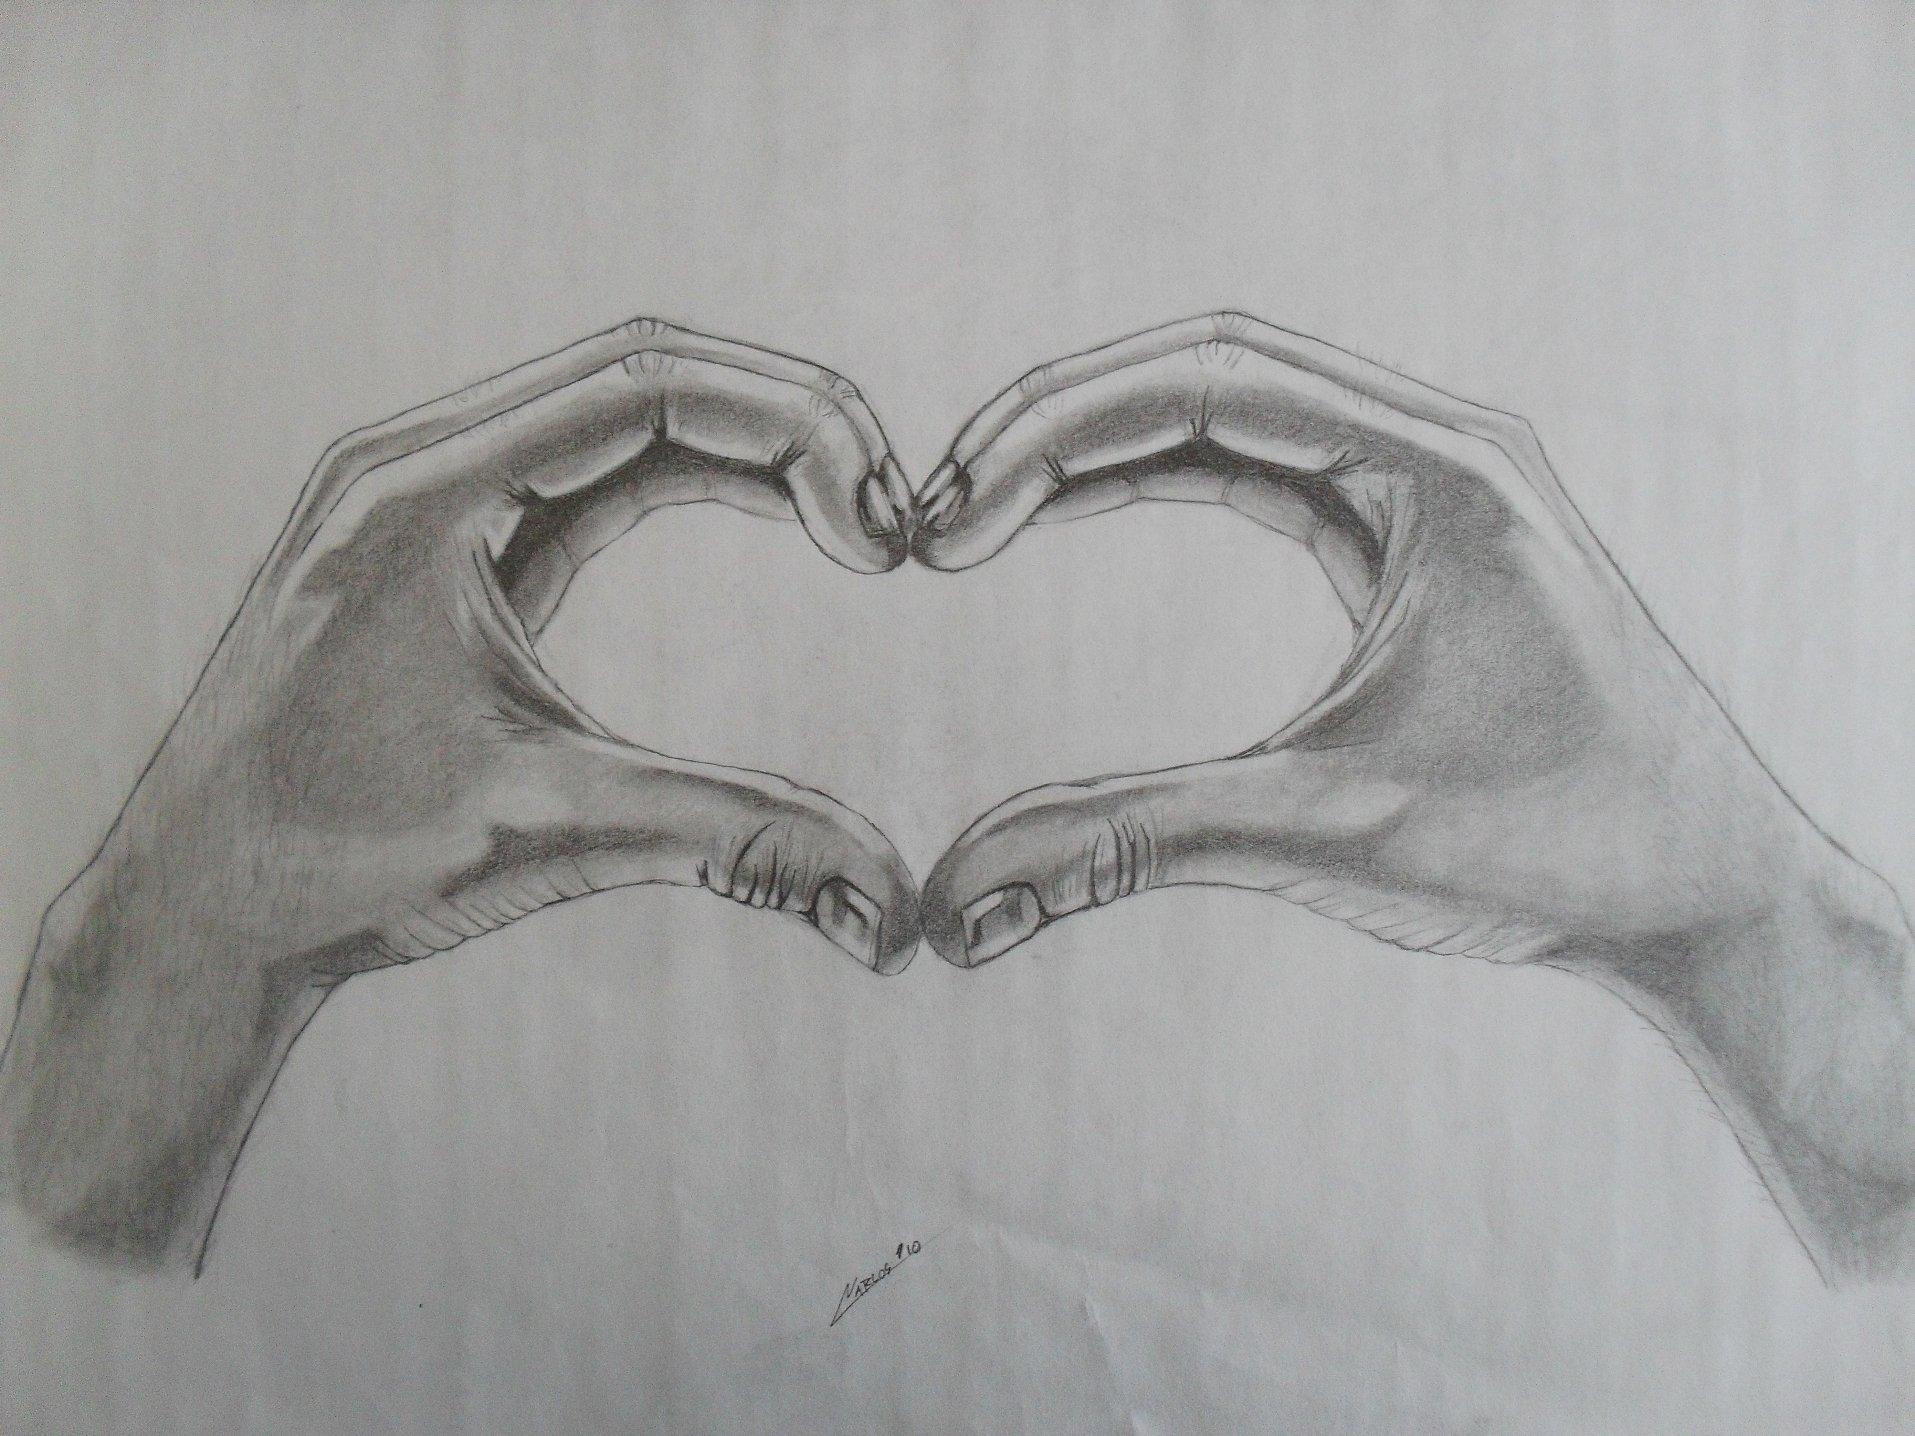 Dibujos A Lapiz De Amor: Dibujos De Amor A Lapiz Chidos Alojamiento De Imgenes